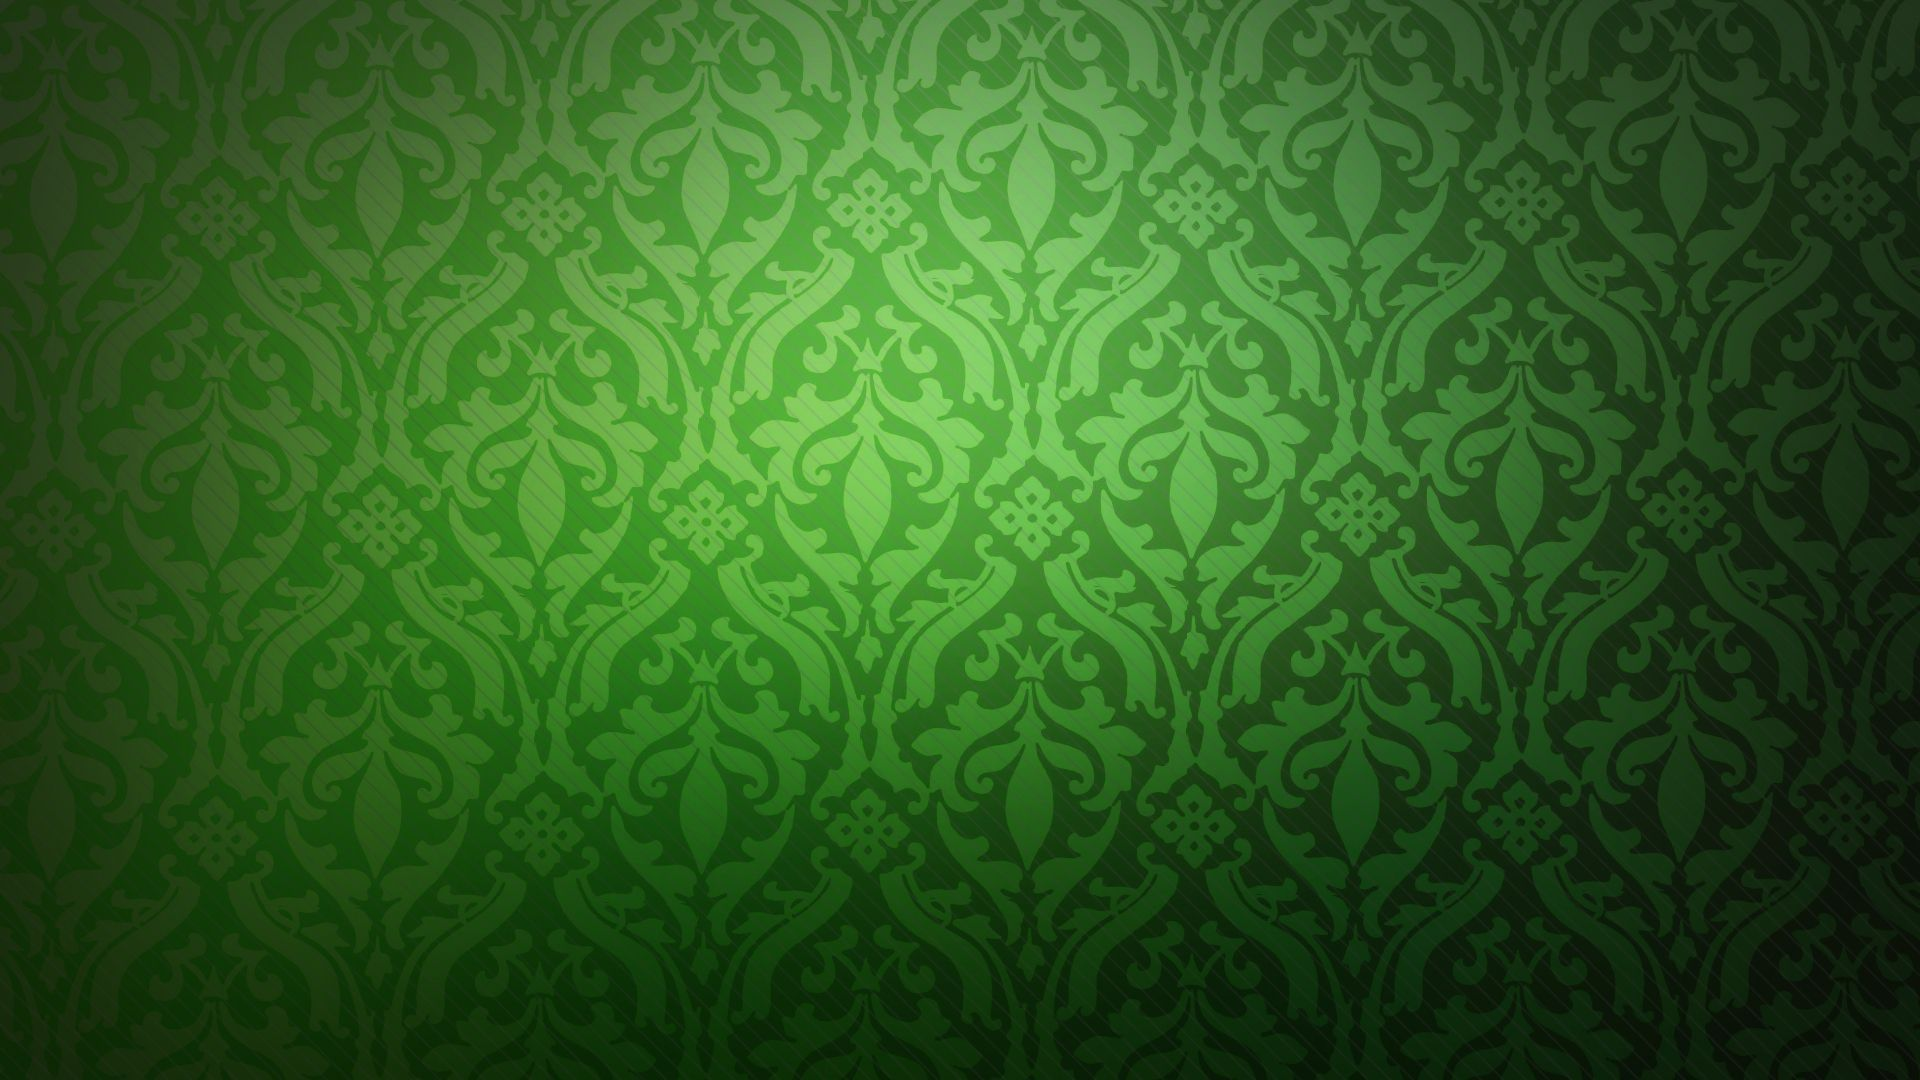 Green Background 17   [1920x1080] 1920x1080